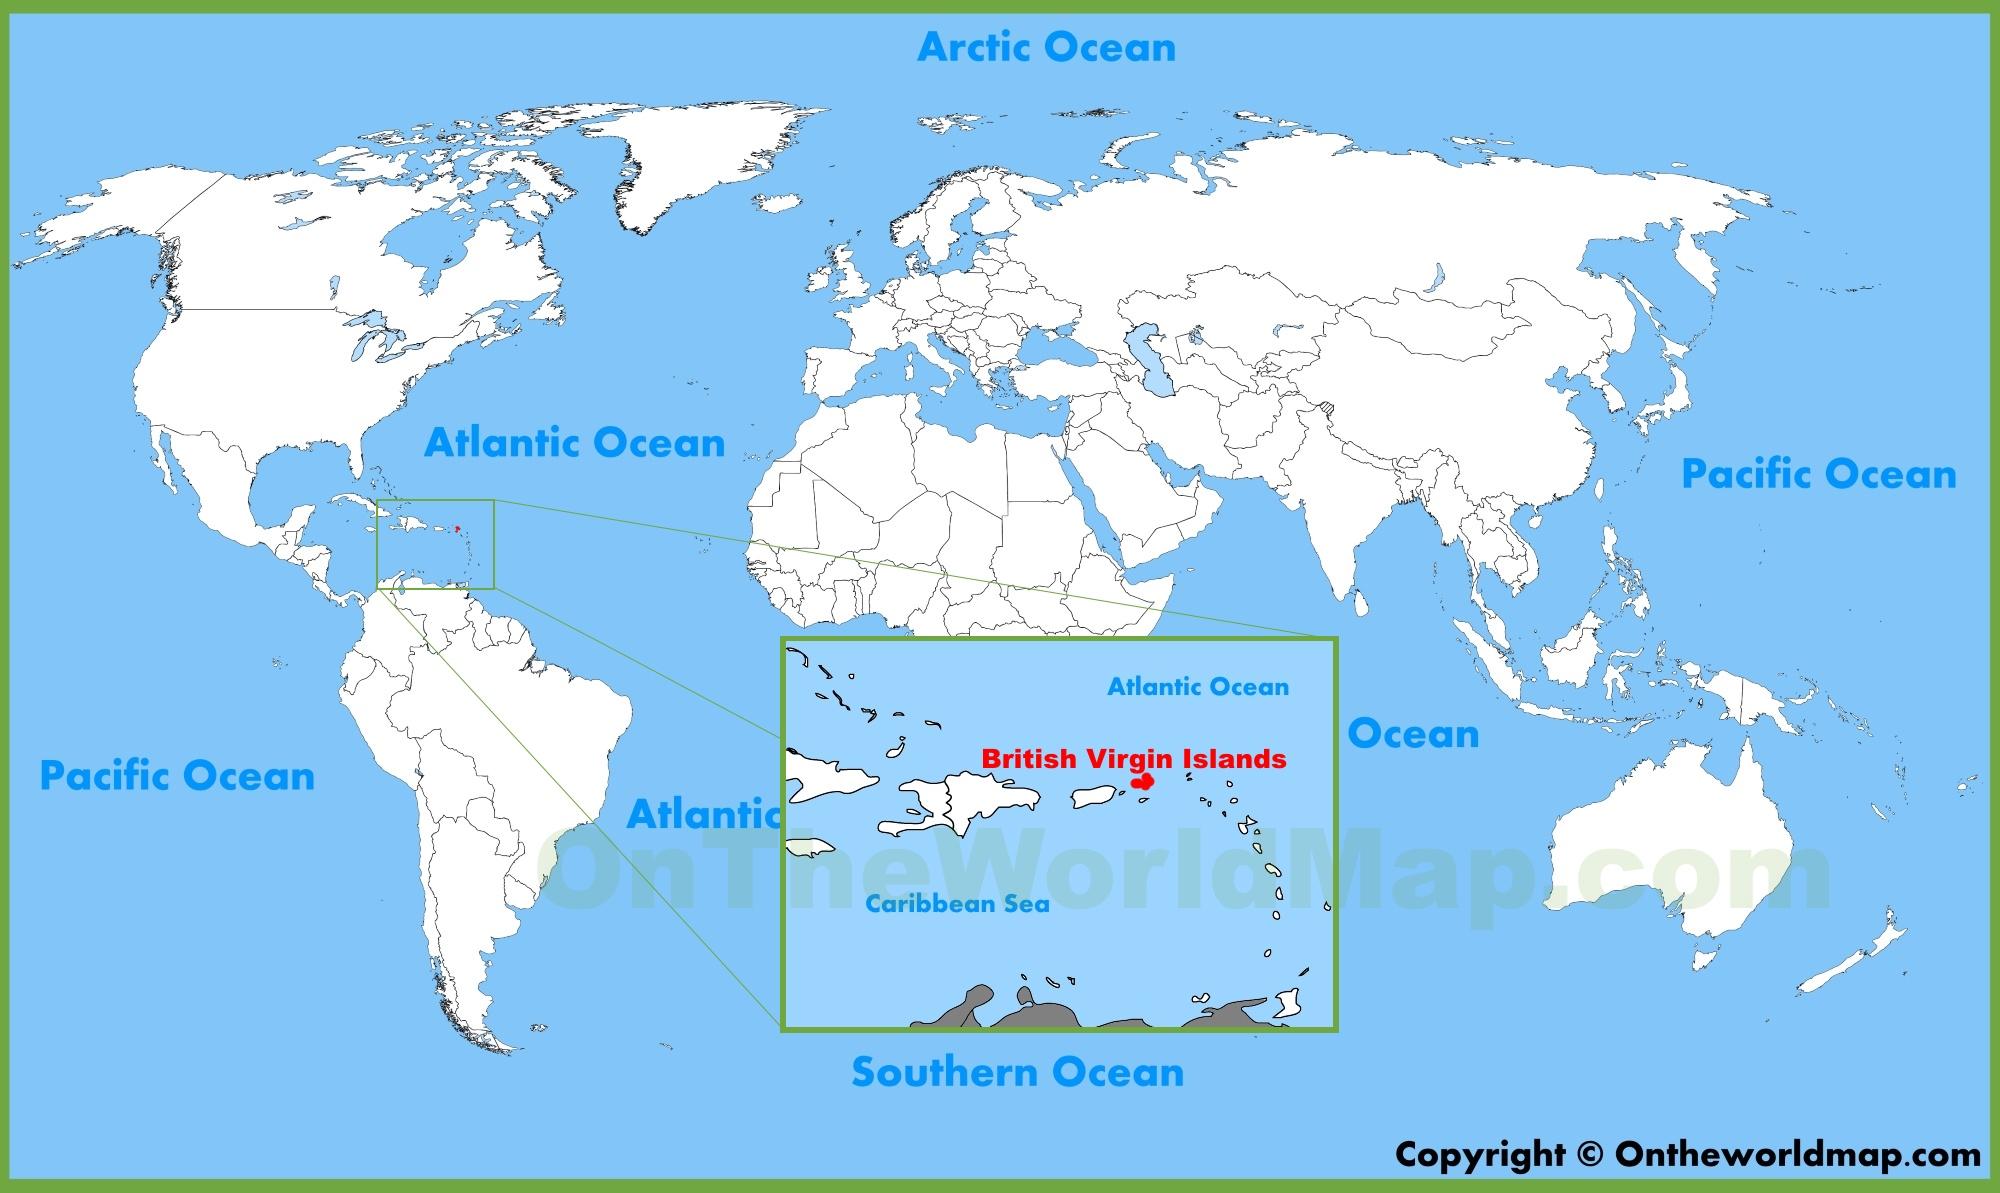 British Virgin Islands Map British Virgin Islands Maps | Maps of British Virgin Islands (BVI) British Virgin Islands Map